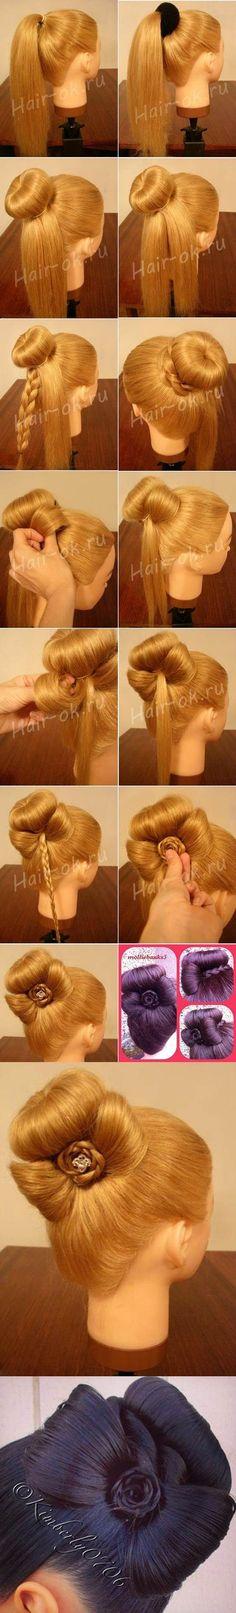 DIY Elegant Bun Decorated with a Bow | iCreativeIdeas.com Like Us on Facebook ==> https://www.facebook.com/icreativeideas